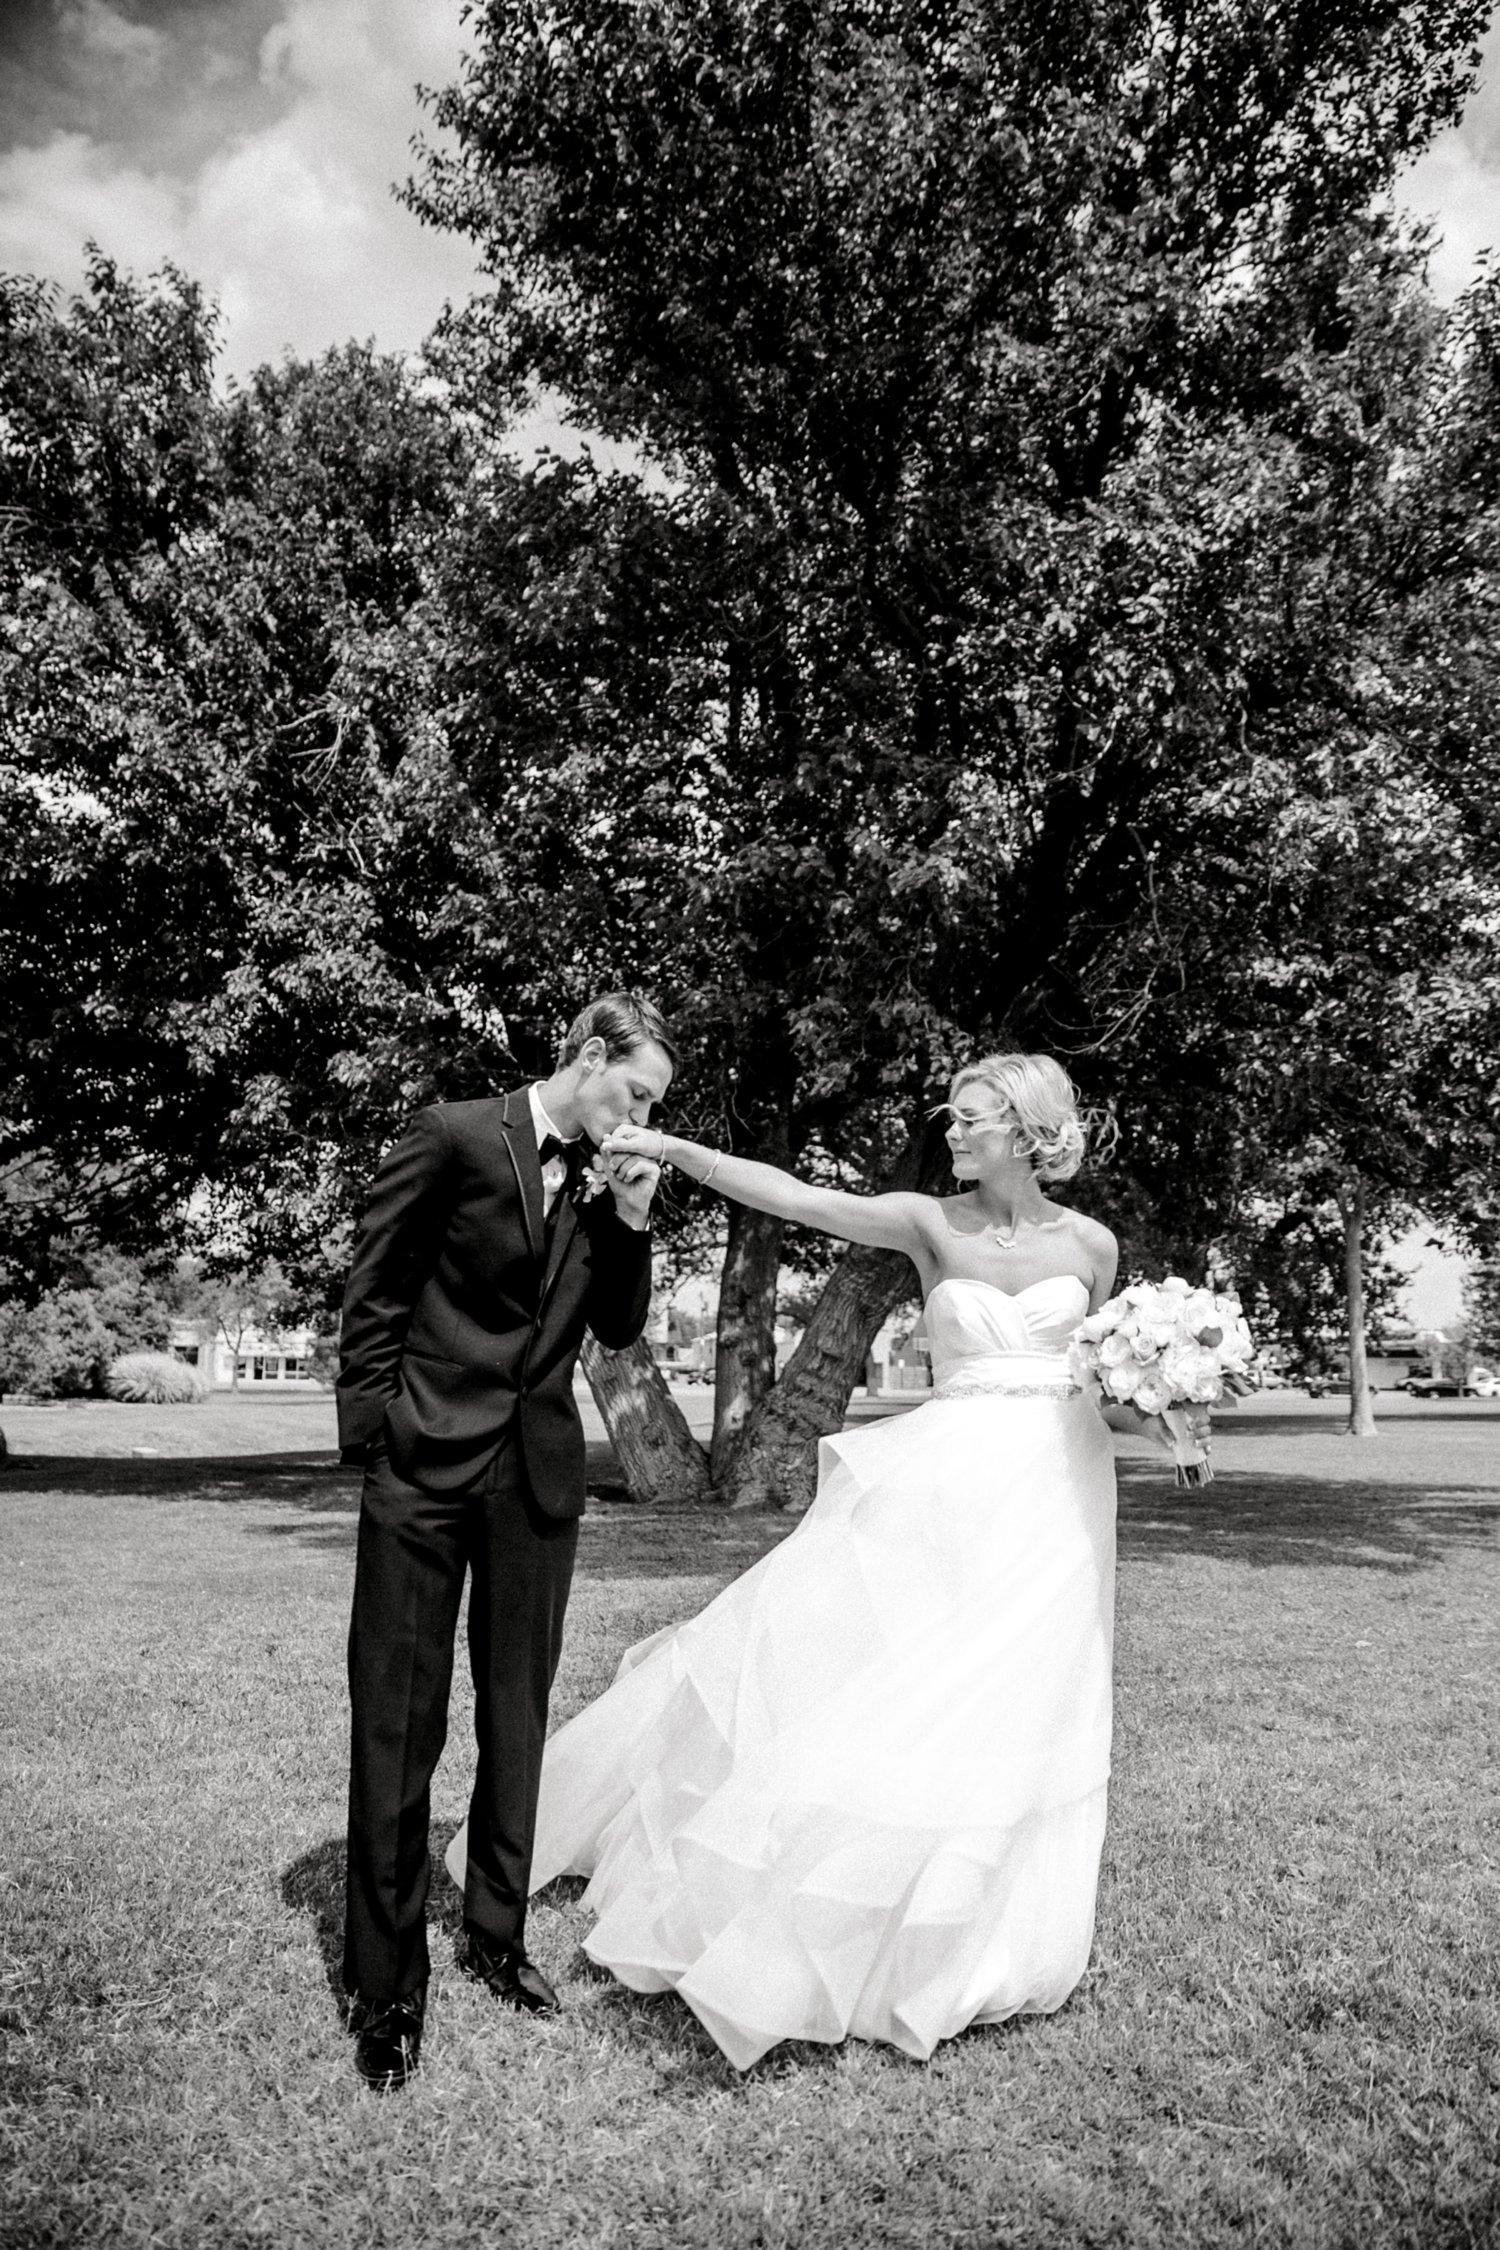 Taylor-and-Brock-Williams-Texas-Tech-University-Merket-Alumni-Center-Lubbock-Photographer-ALLEEJ0097.jpg